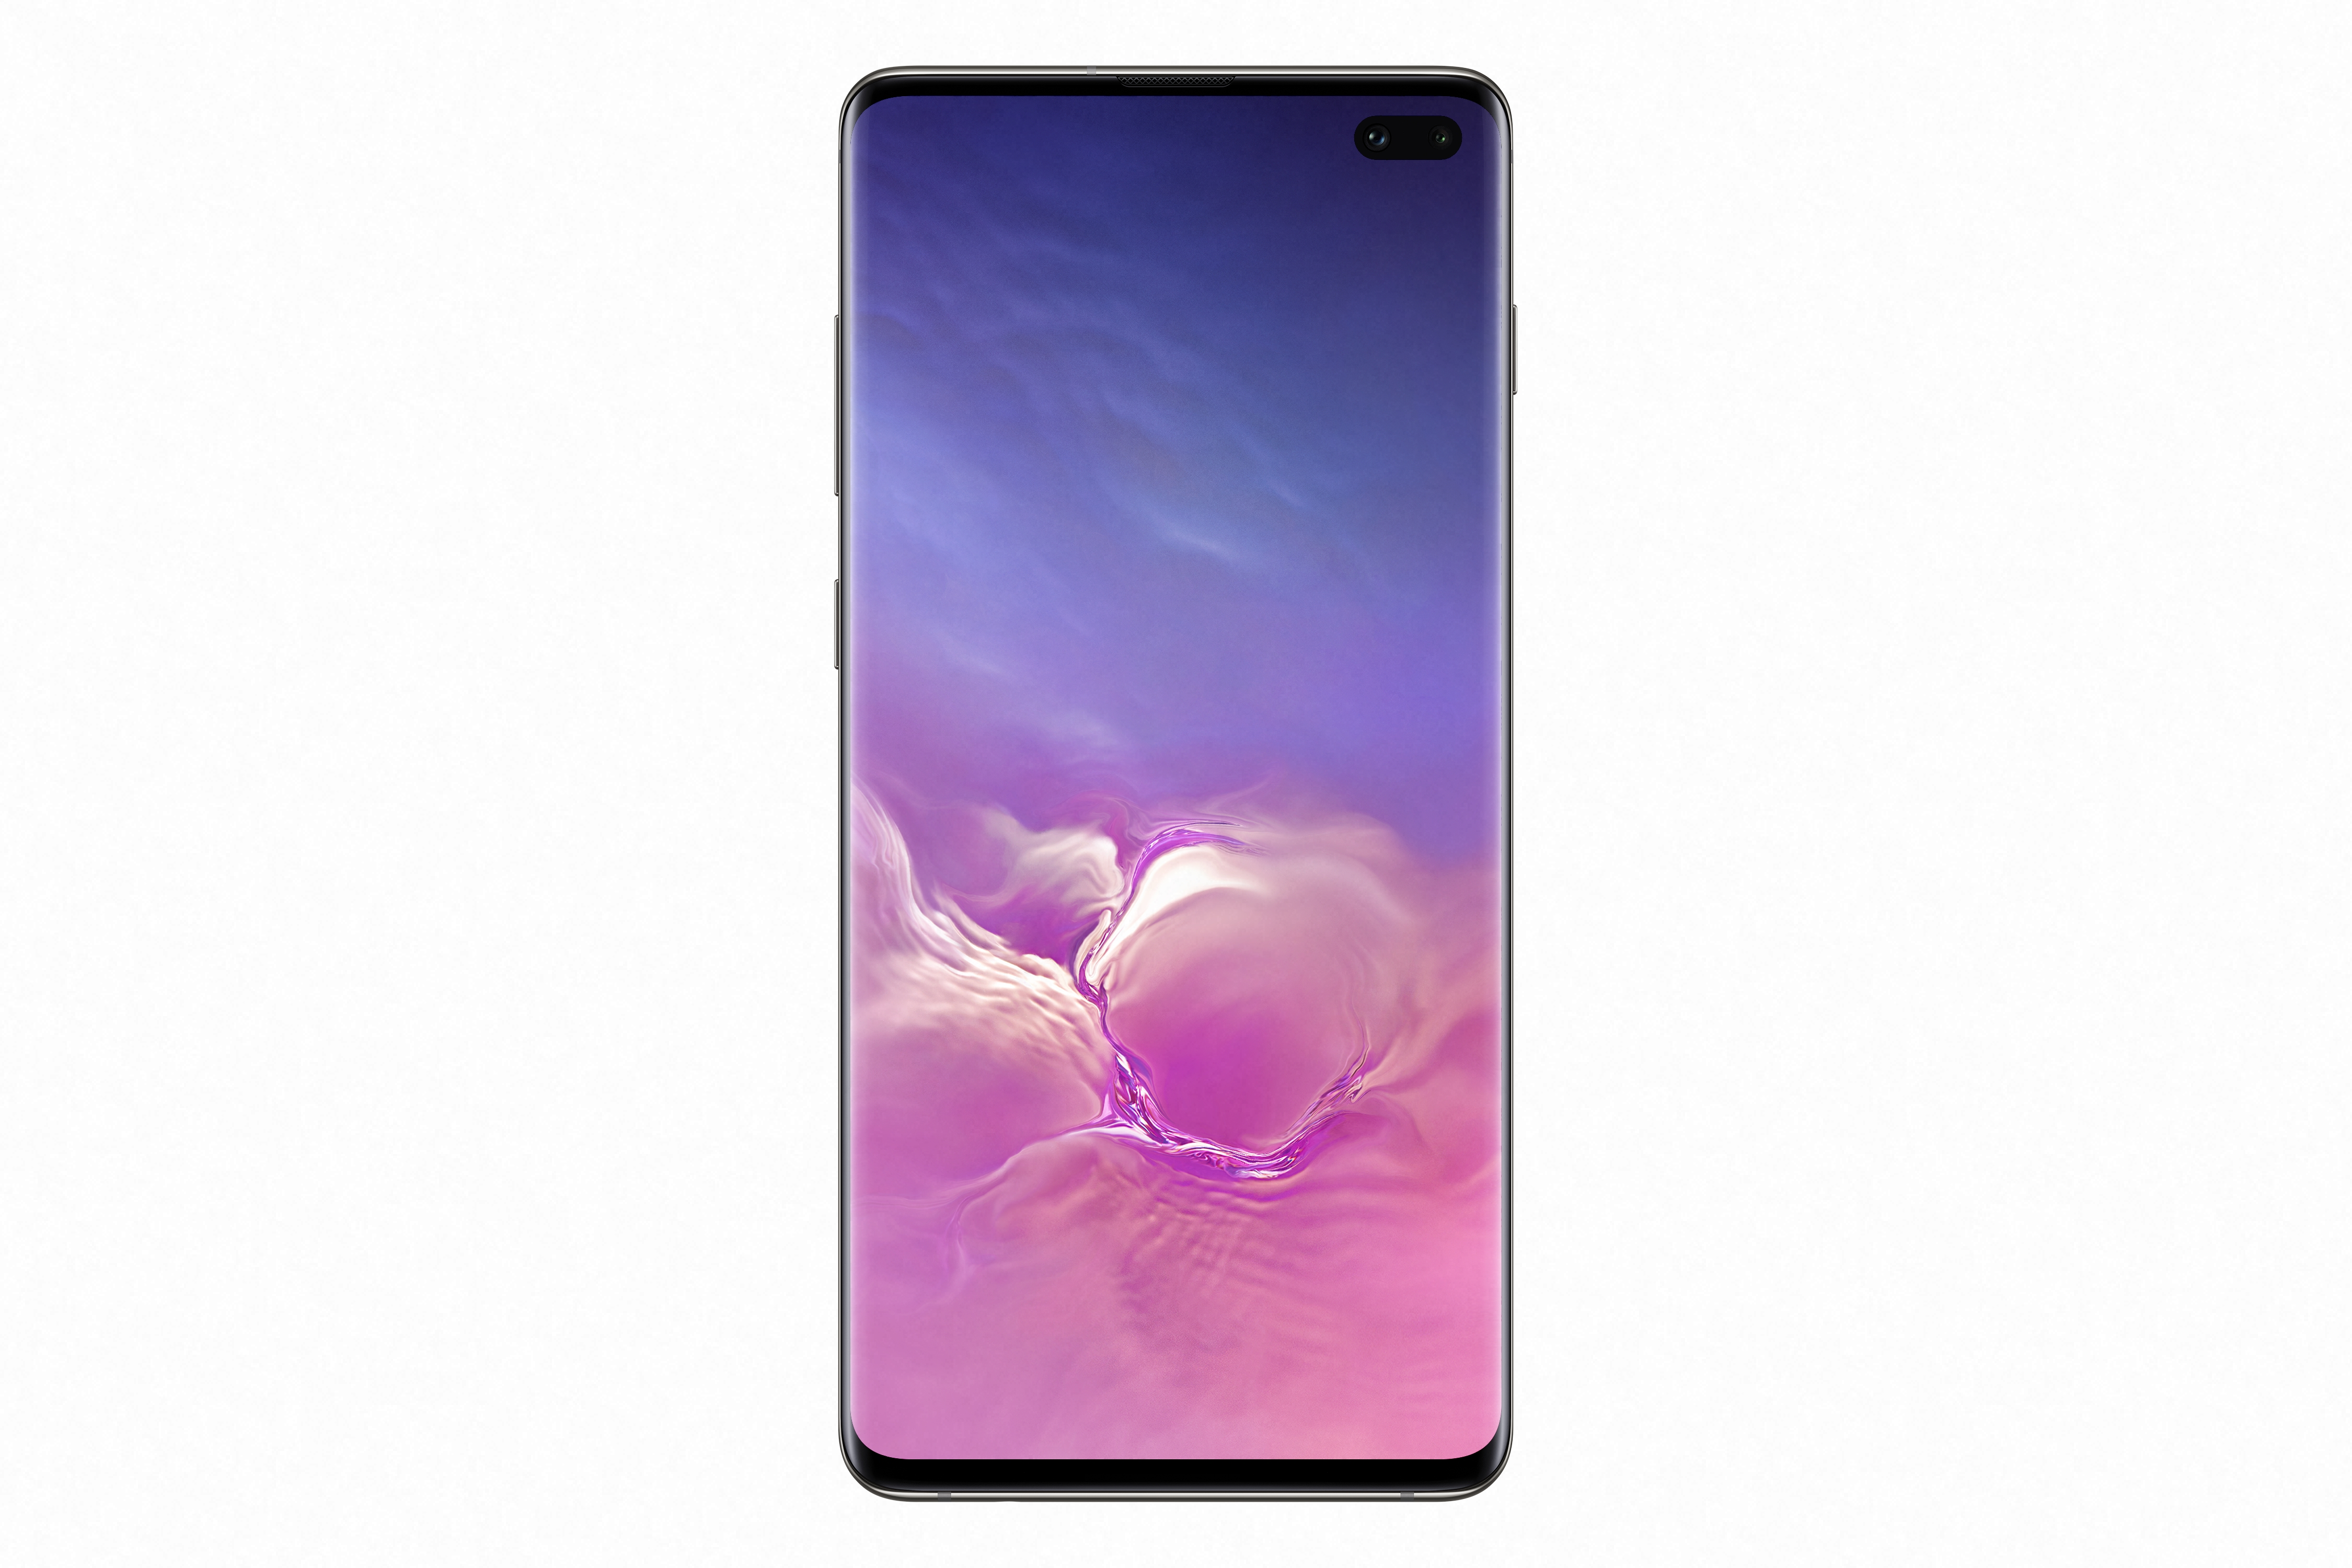 Telefon Mobil Samsung Galaxy S10+ G975 128GB Flash 8GB RAM Dual SIM 4G Gradation Black